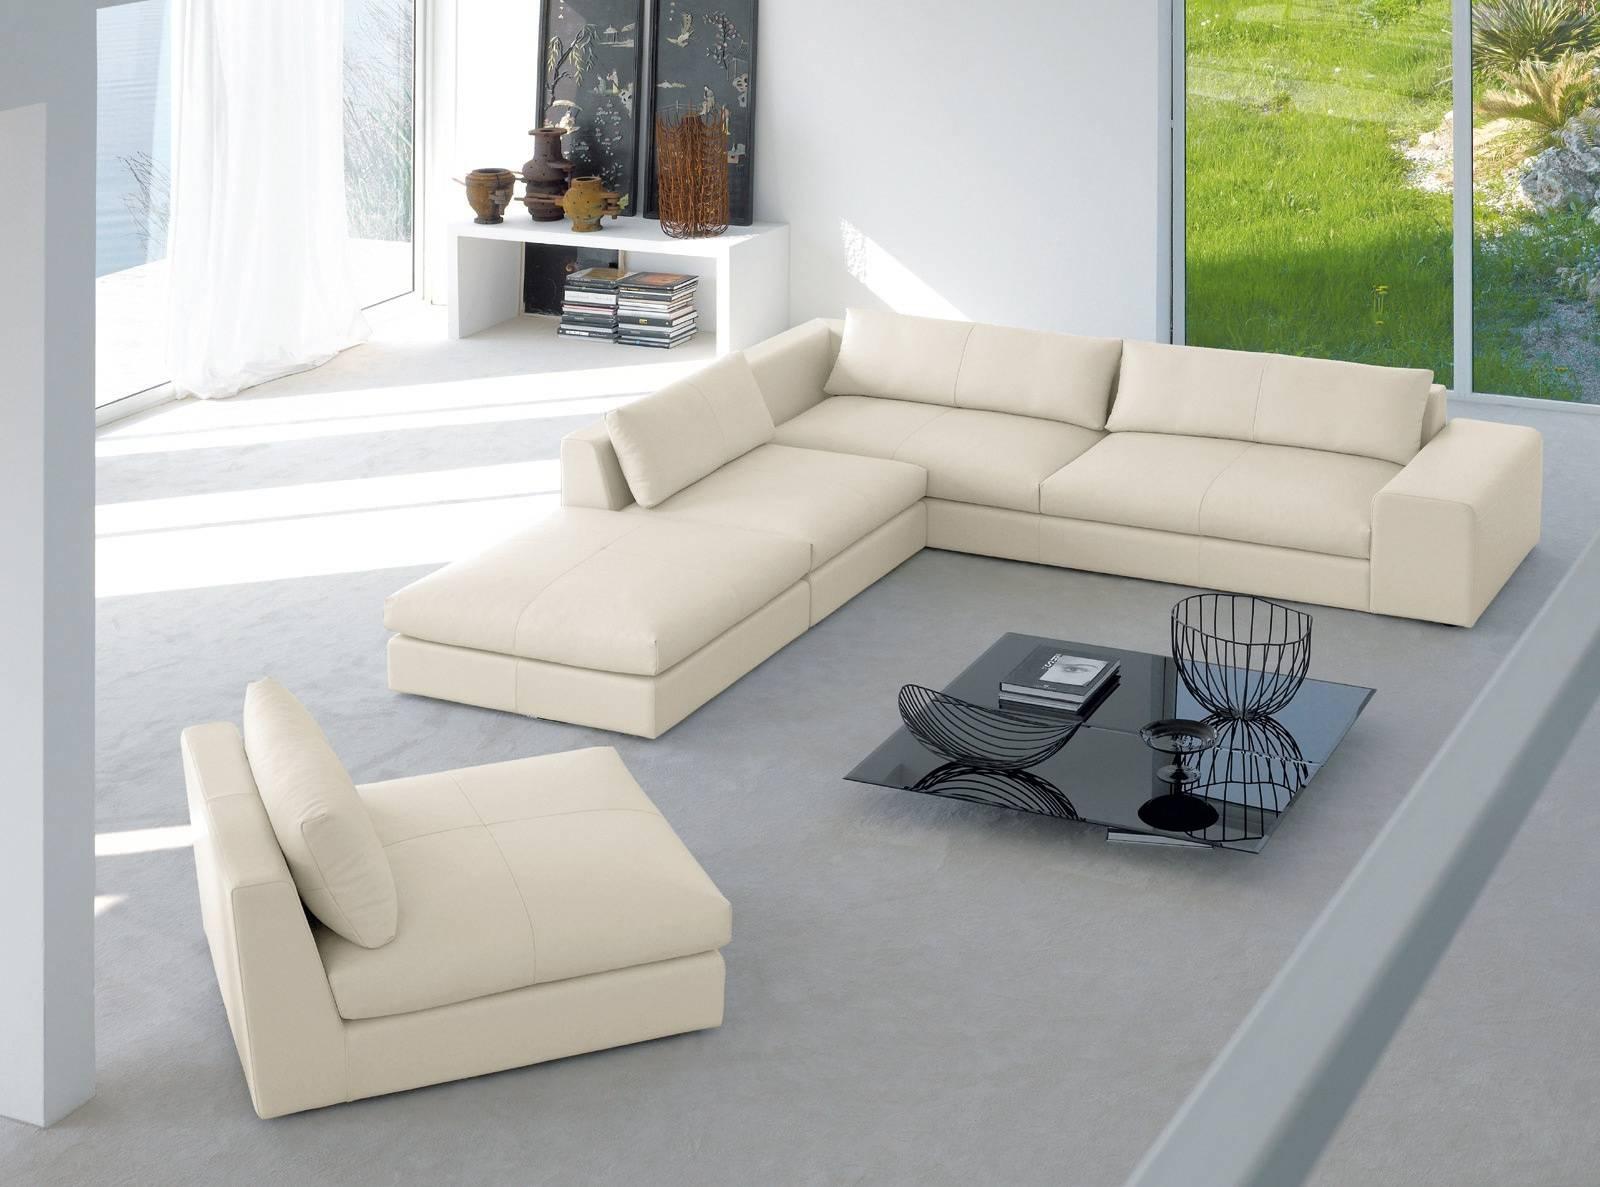 Modular Sofa Newport, Alberta Salotti - Luxury Furniture Mr with regard to Newport Sofas (Image 9 of 30)